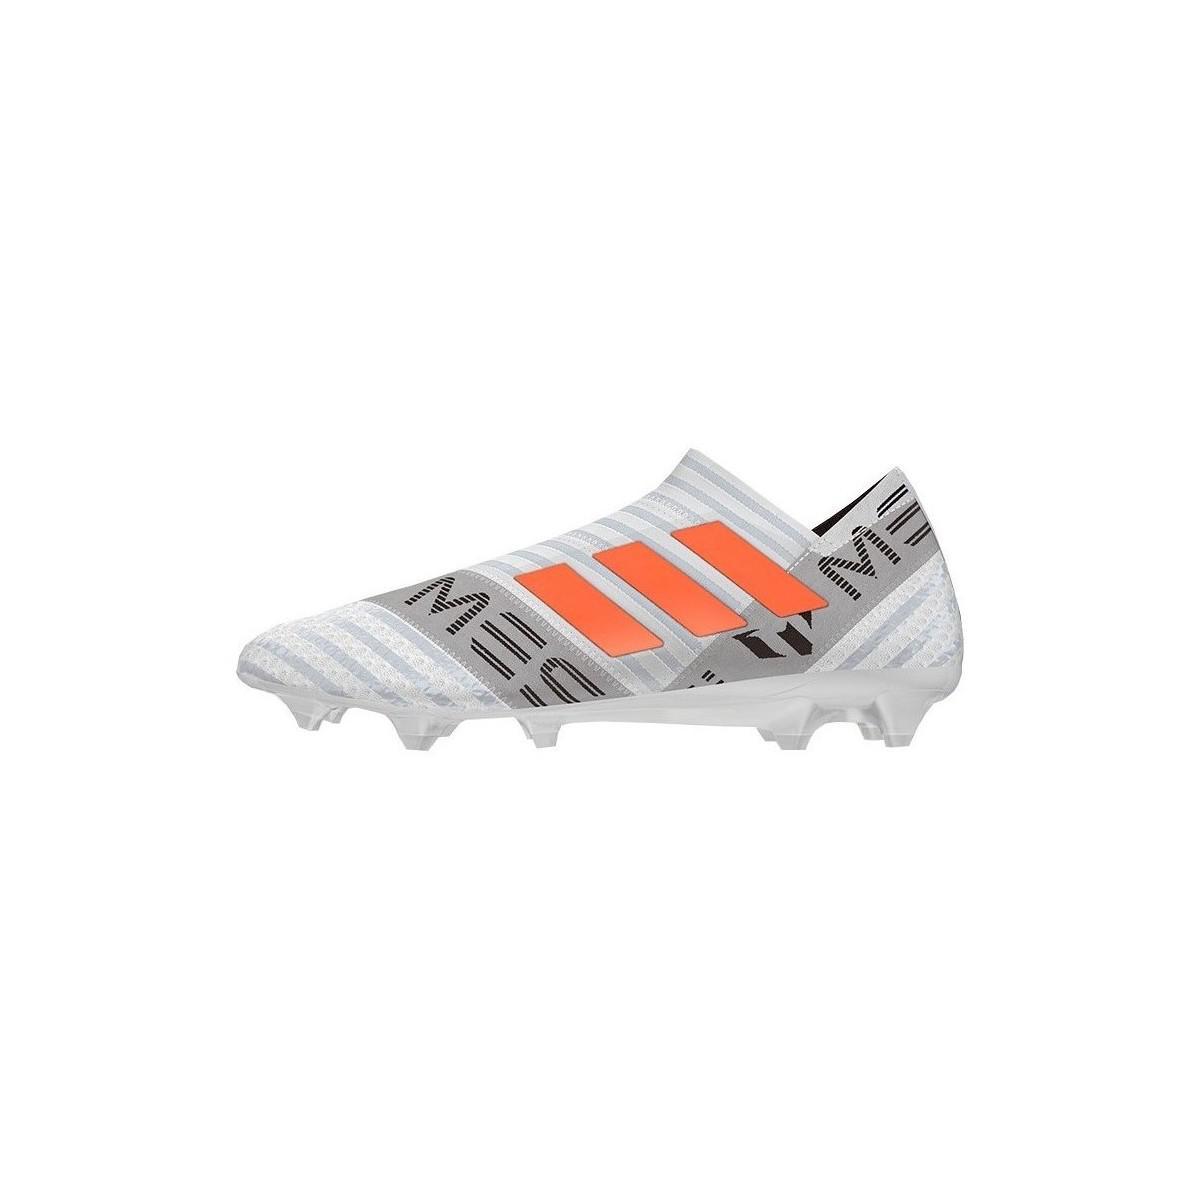 Adidas Nemeziz Messi 17 360 Agility Fg Men s Football Boots In Grey ... 52d6cab4b36